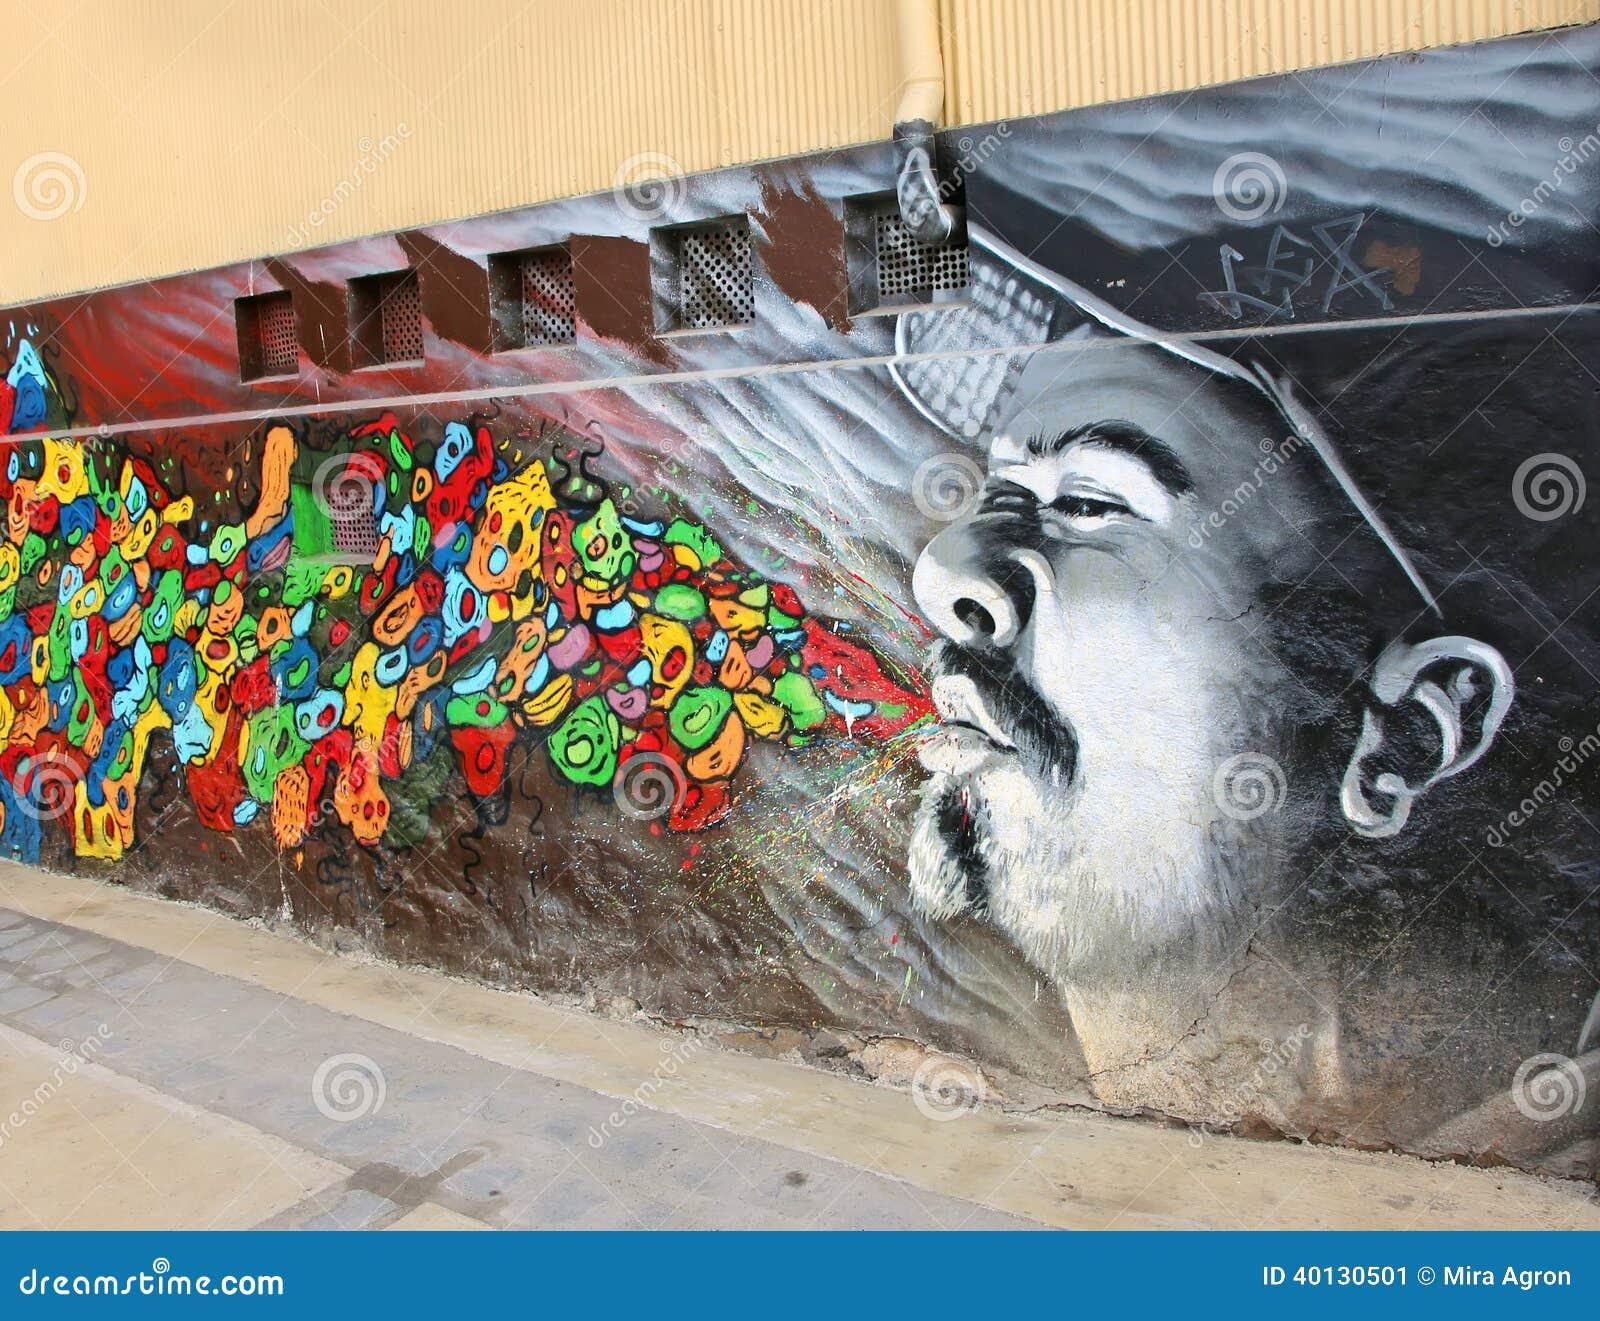 graffiti in valparaiso editorial photo